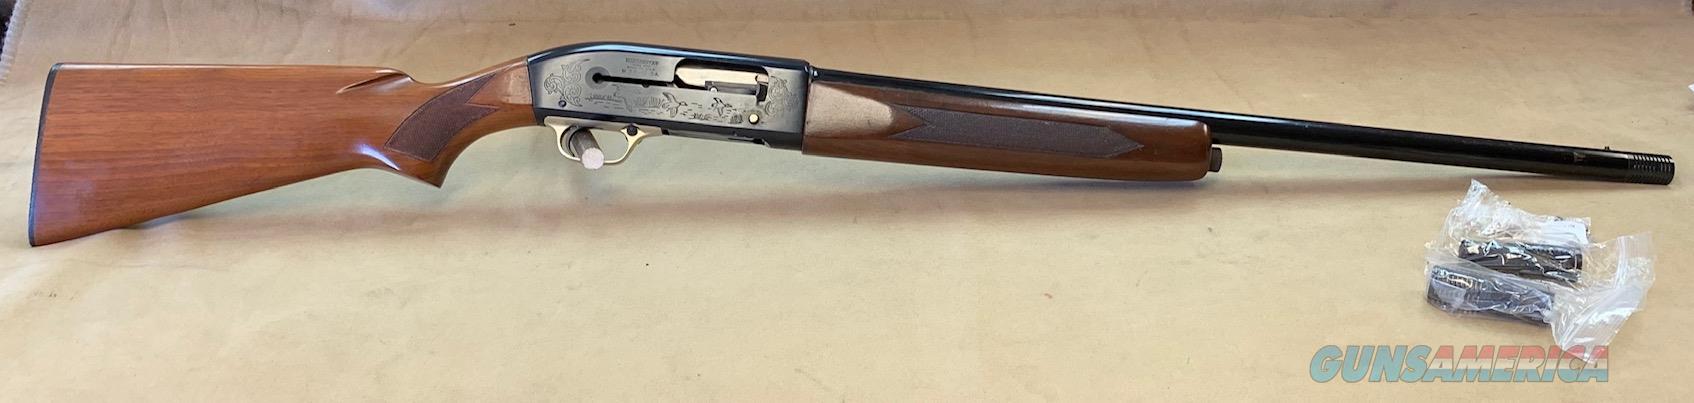 Winchester 59 - 12 gauge - Used, Consignment  Guns > Shotguns > Winchester Shotguns - Modern > Autoloaders > Hunting